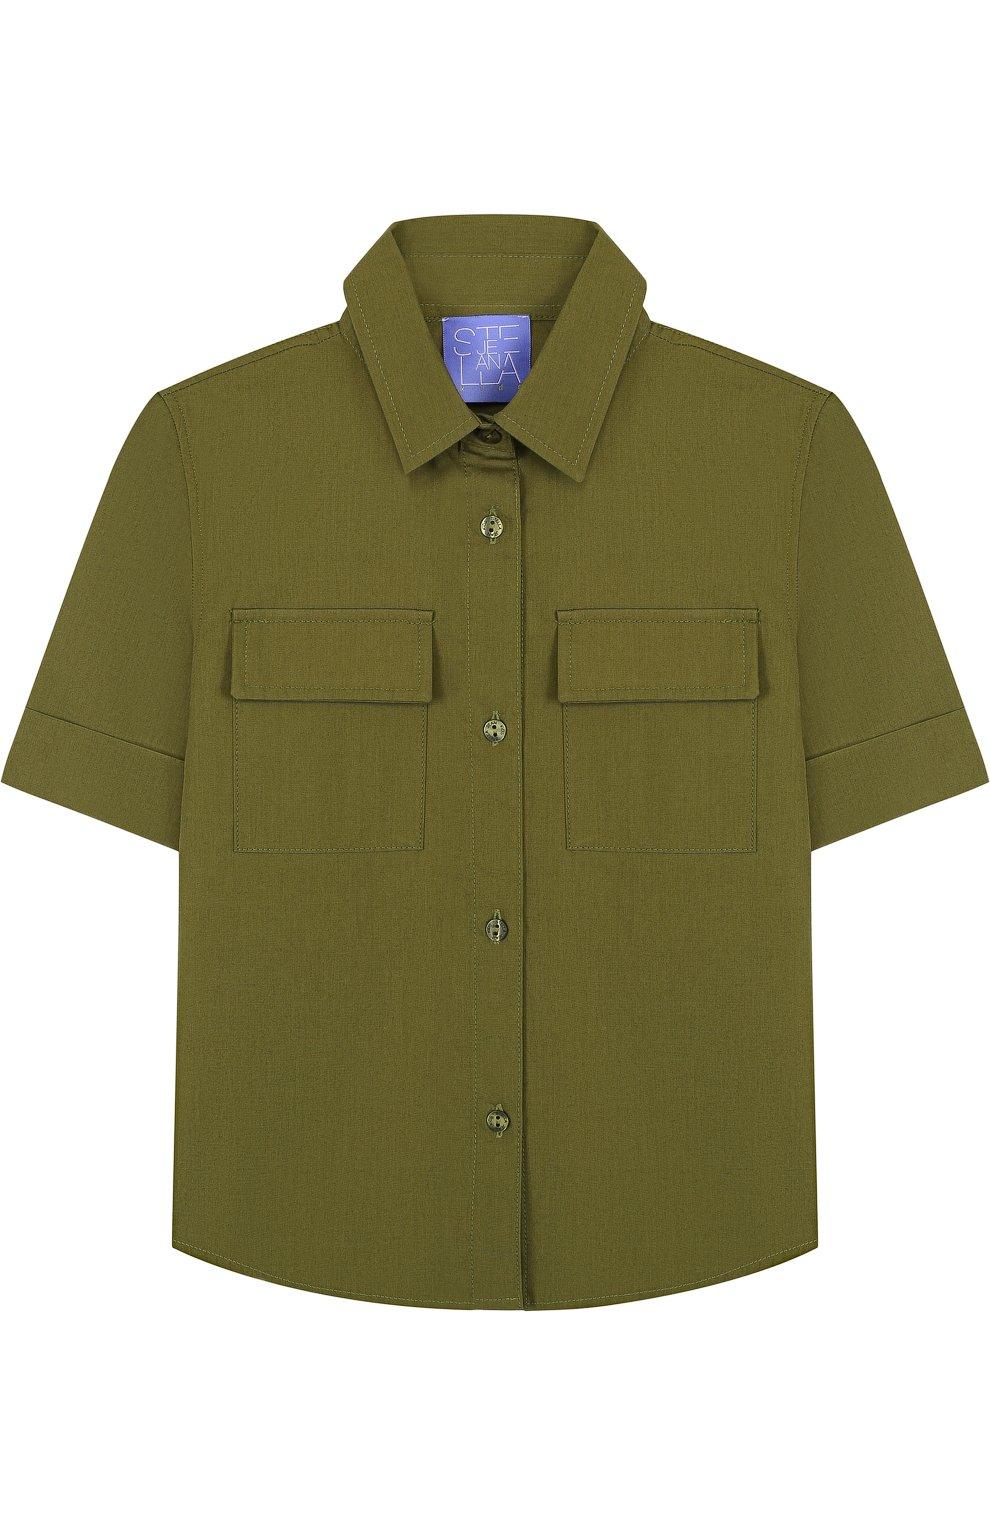 Детское хлопковая блуза прямого кроя с накладными карманами STELLA JEAN KIDS хаки цвета, арт. J/JF/CA23/0317/8A-14A   Фото 1